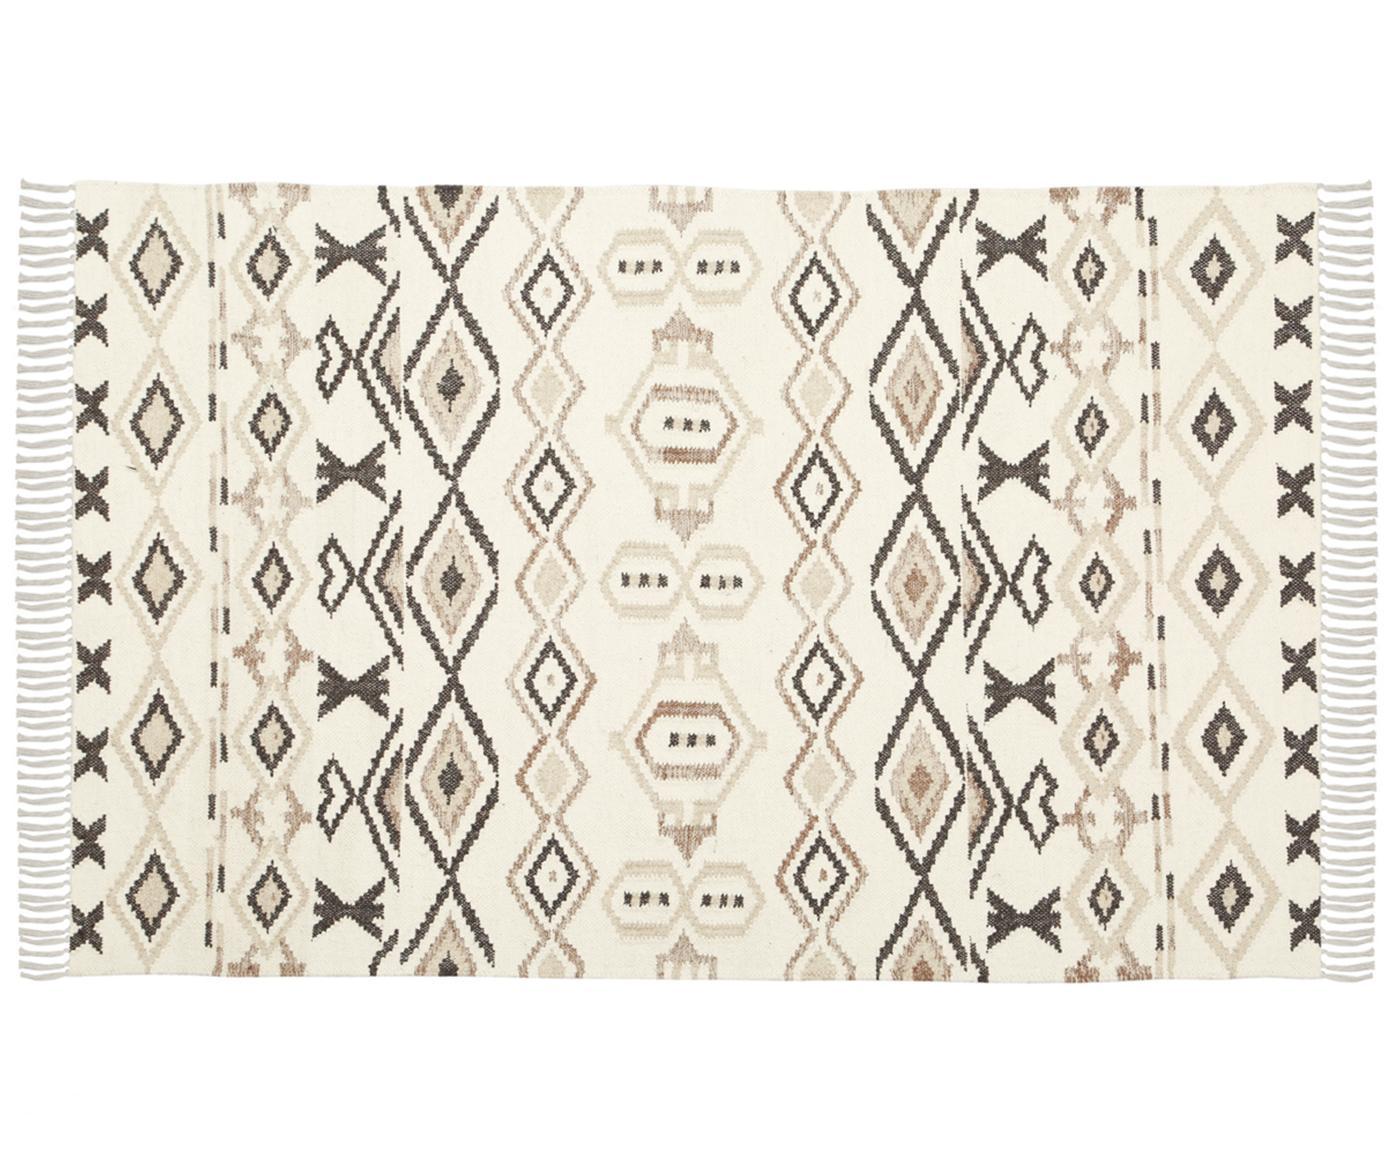 Handgewebter Teppich Silia, 120 x 180 cm